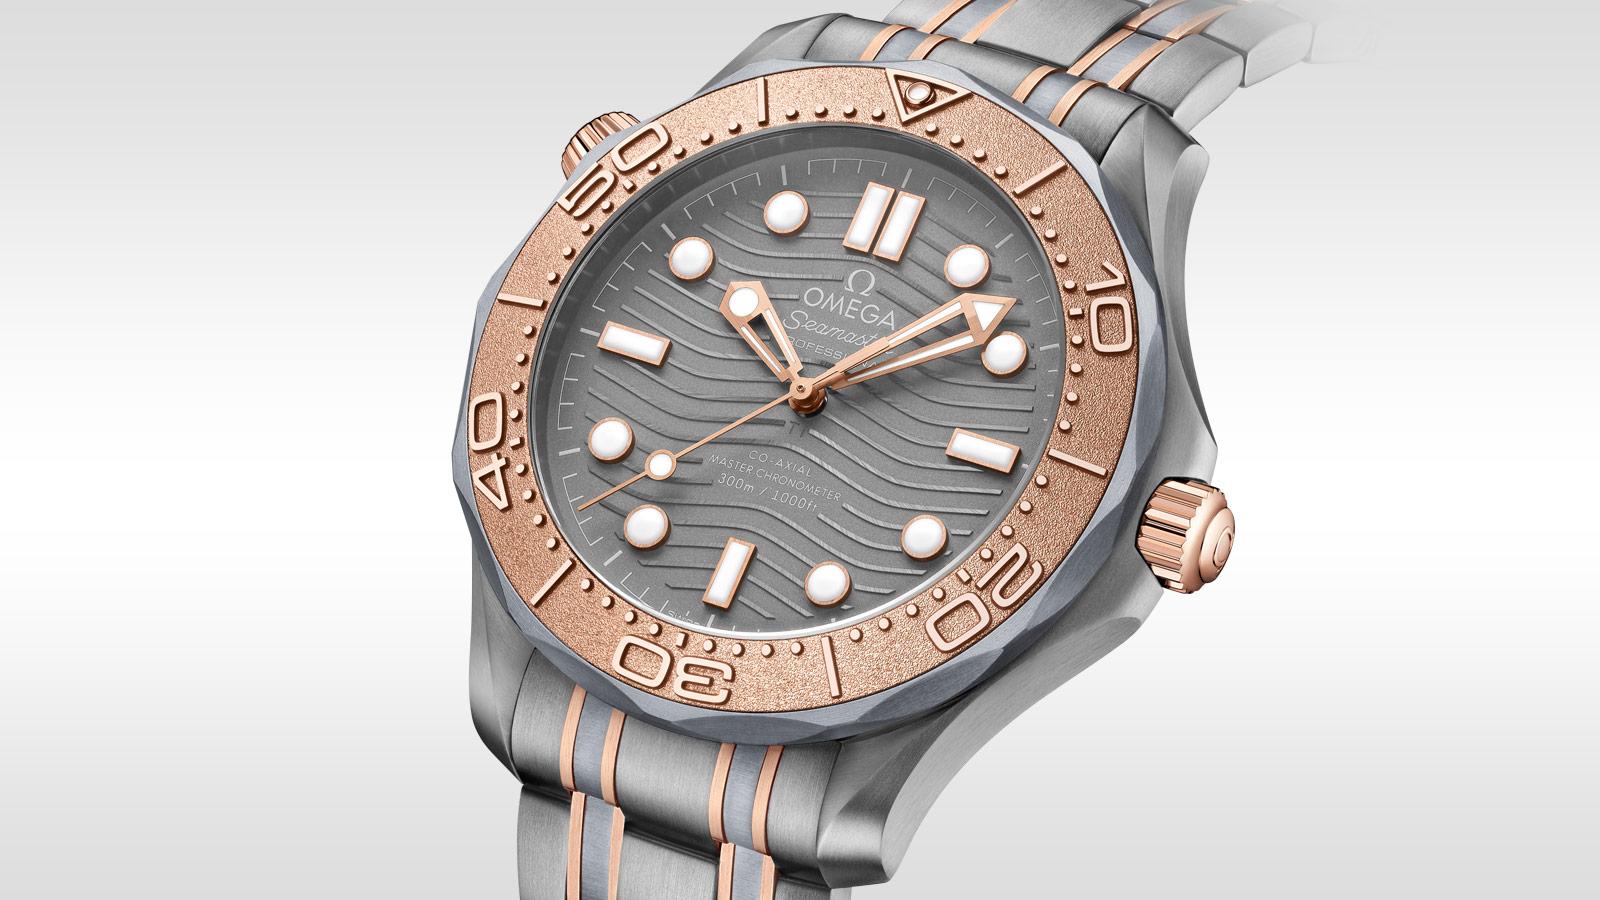 Seamaster 300米潜水表 300米潜水表 欧米茄同轴•至臻天文台表42毫米 - 210.60.42.20.99.001 - 查看 1